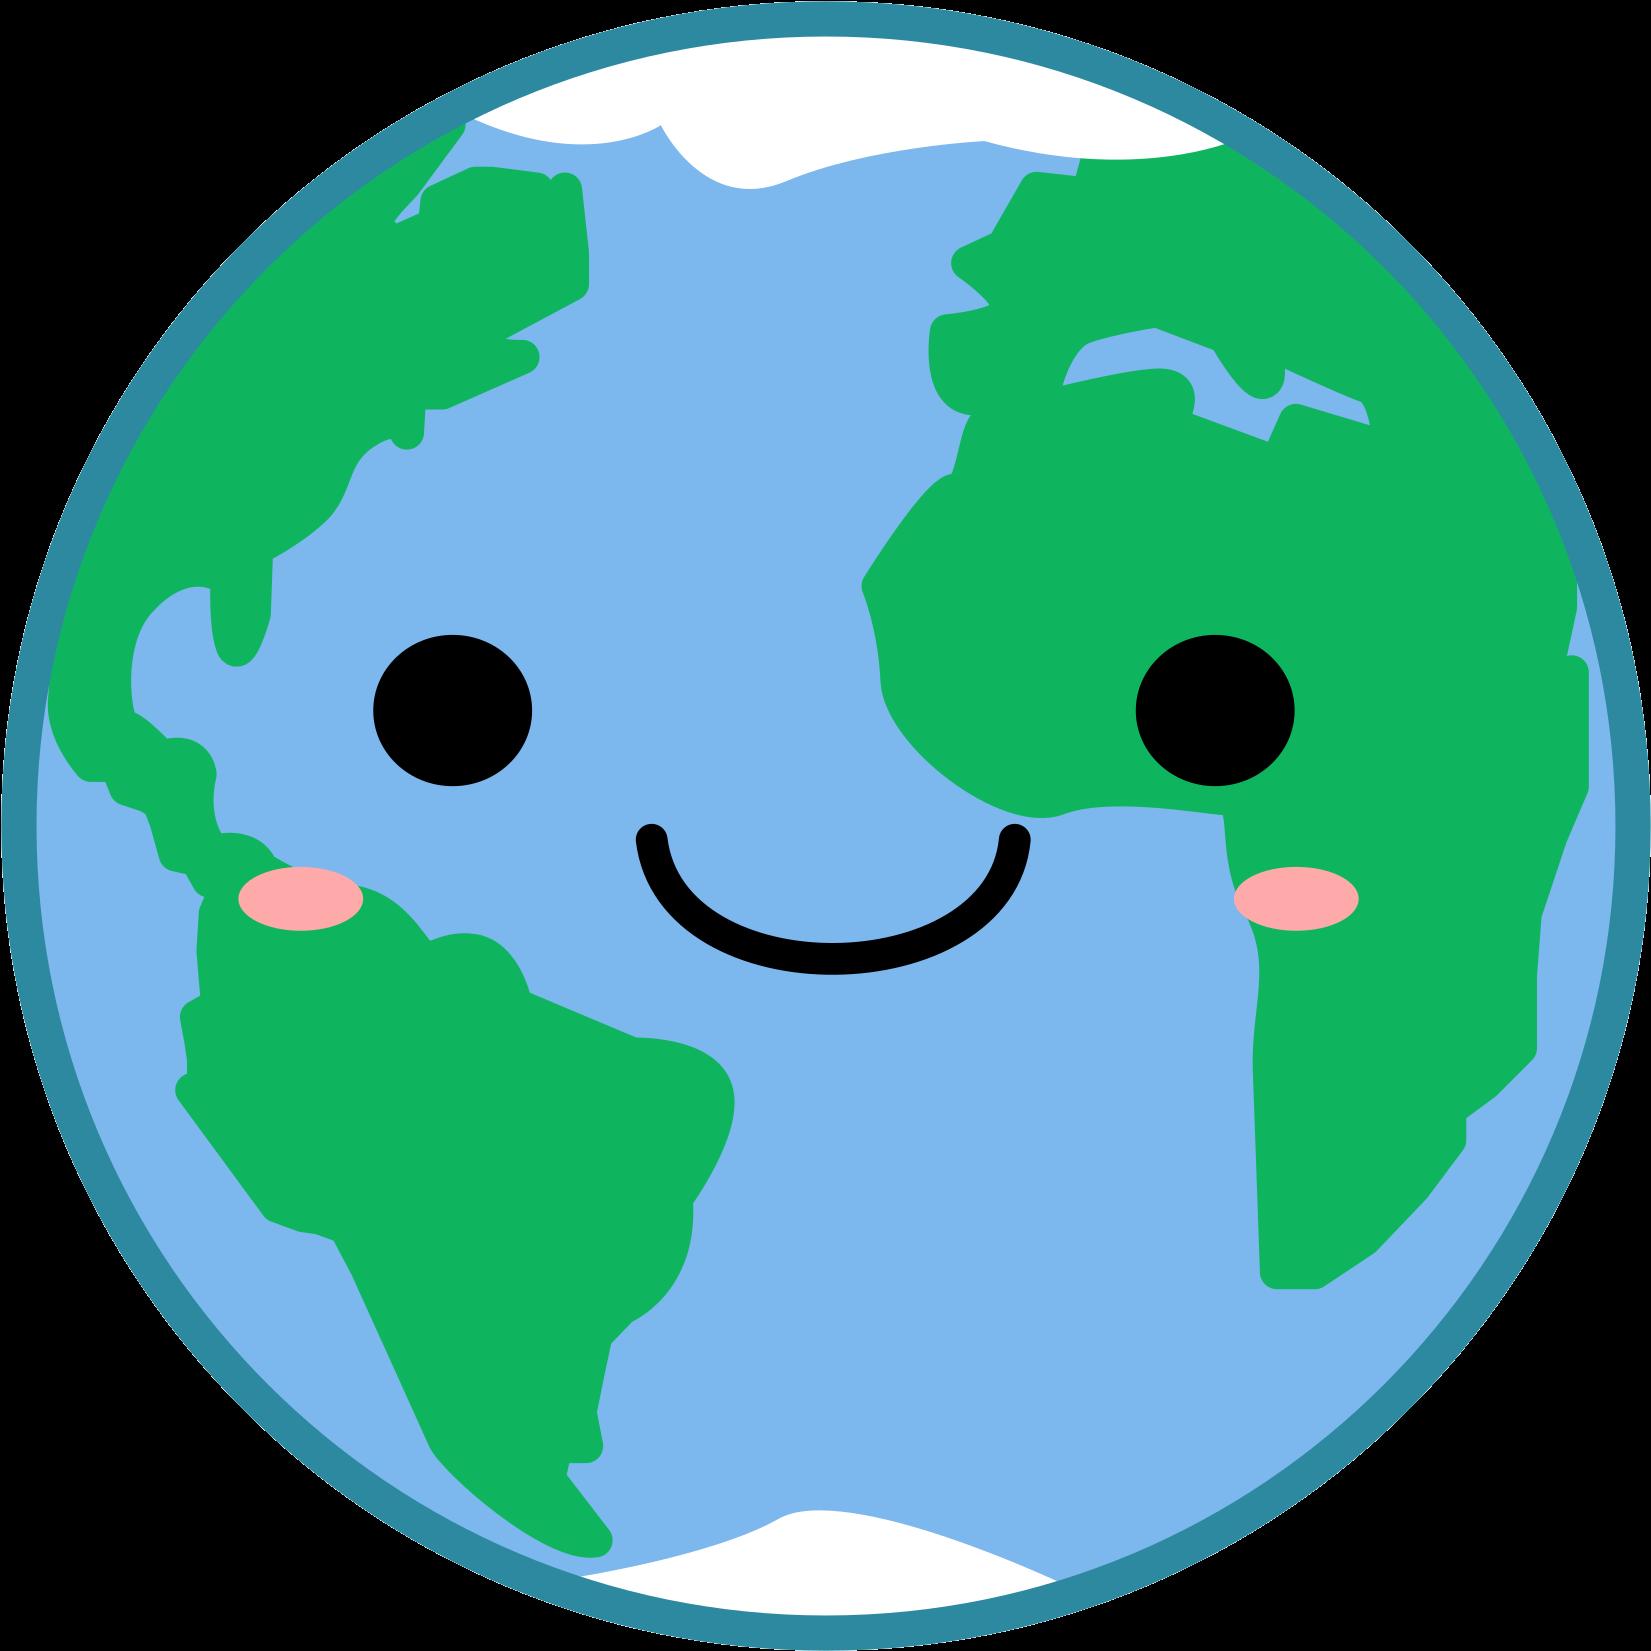 Globe earth clipart.